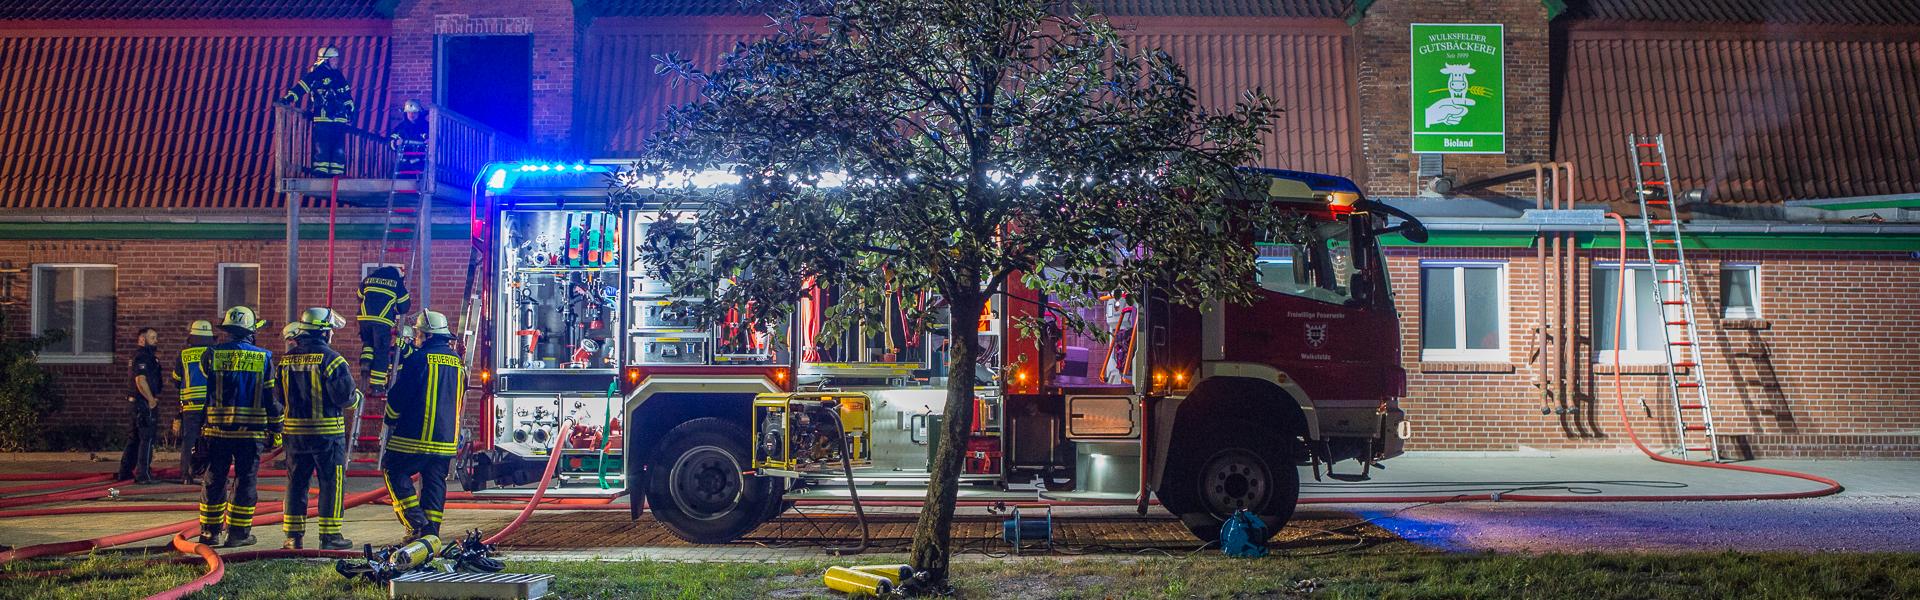 16.08.2018 – Feuer auf Gut Wulksfelde